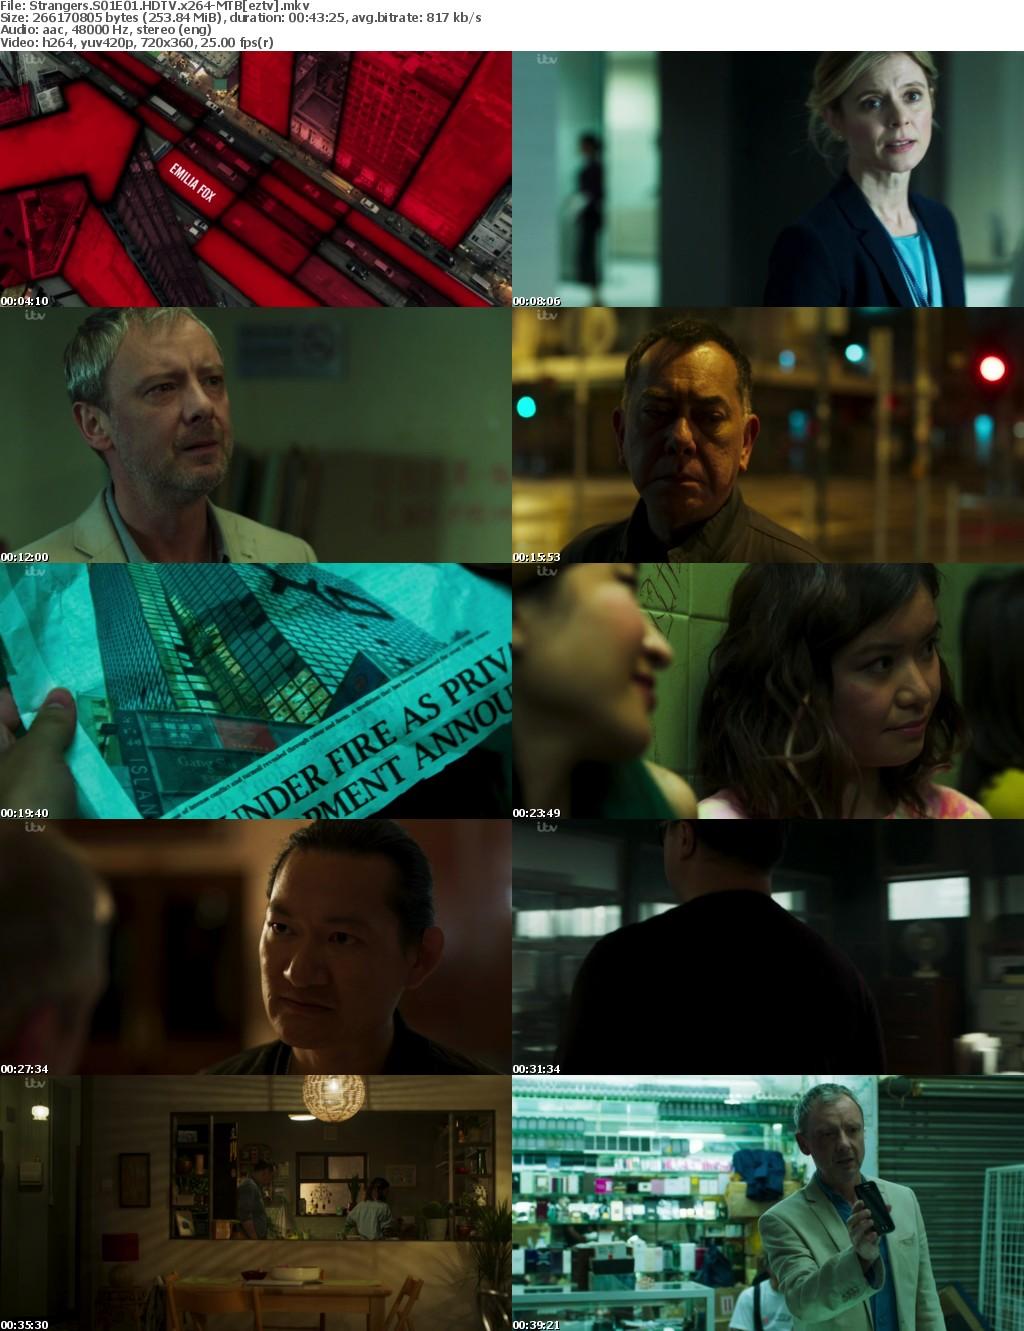 Strangers S01E01 HDTV x264-MTB